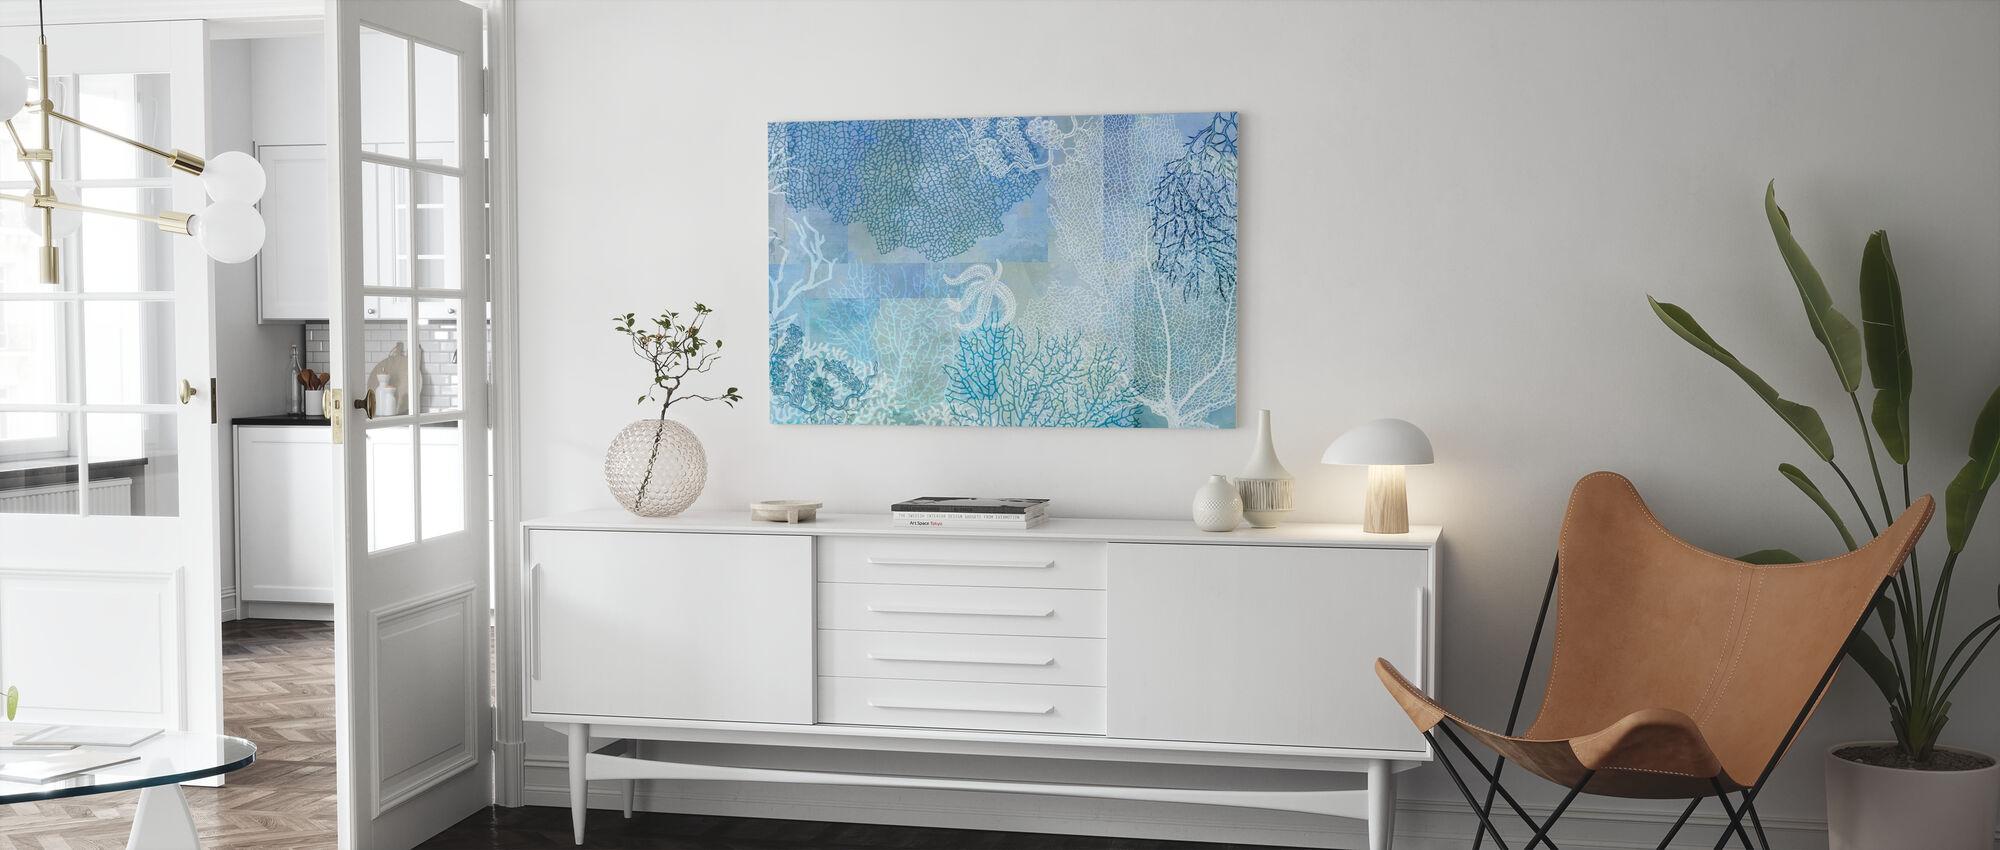 Blue Sea Water - Canvas print - Living Room